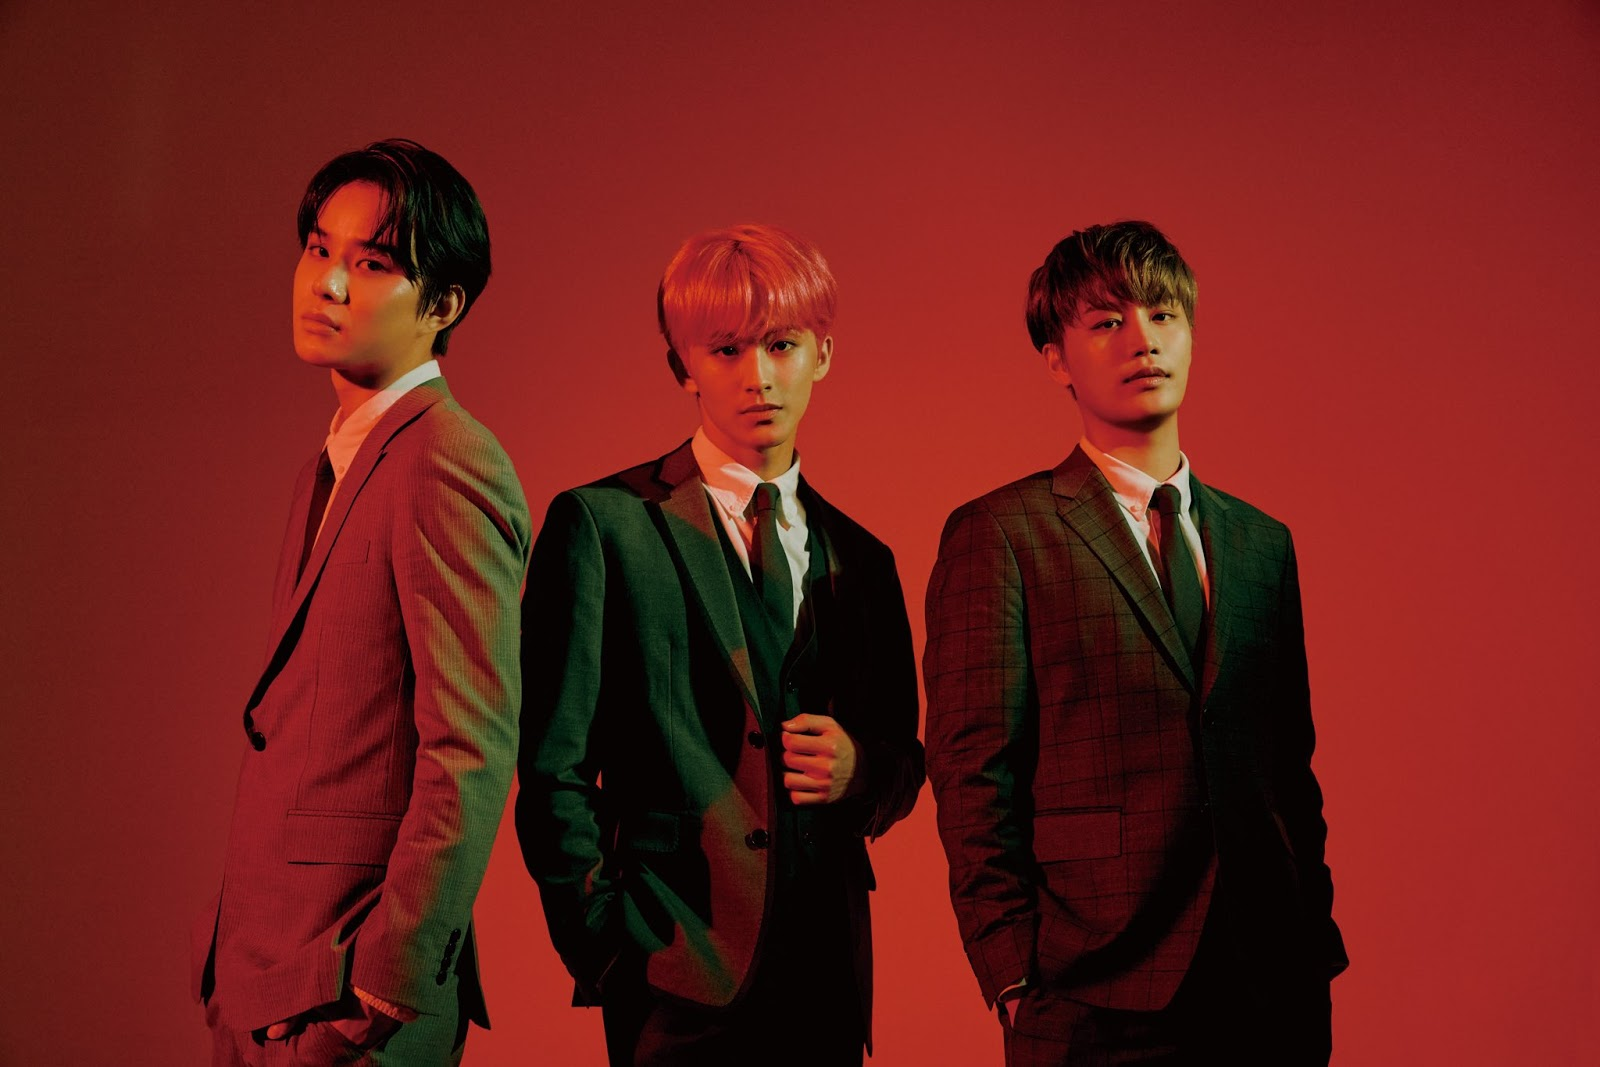 nct 127 japon comeback loveholic taeil jungwoo mark